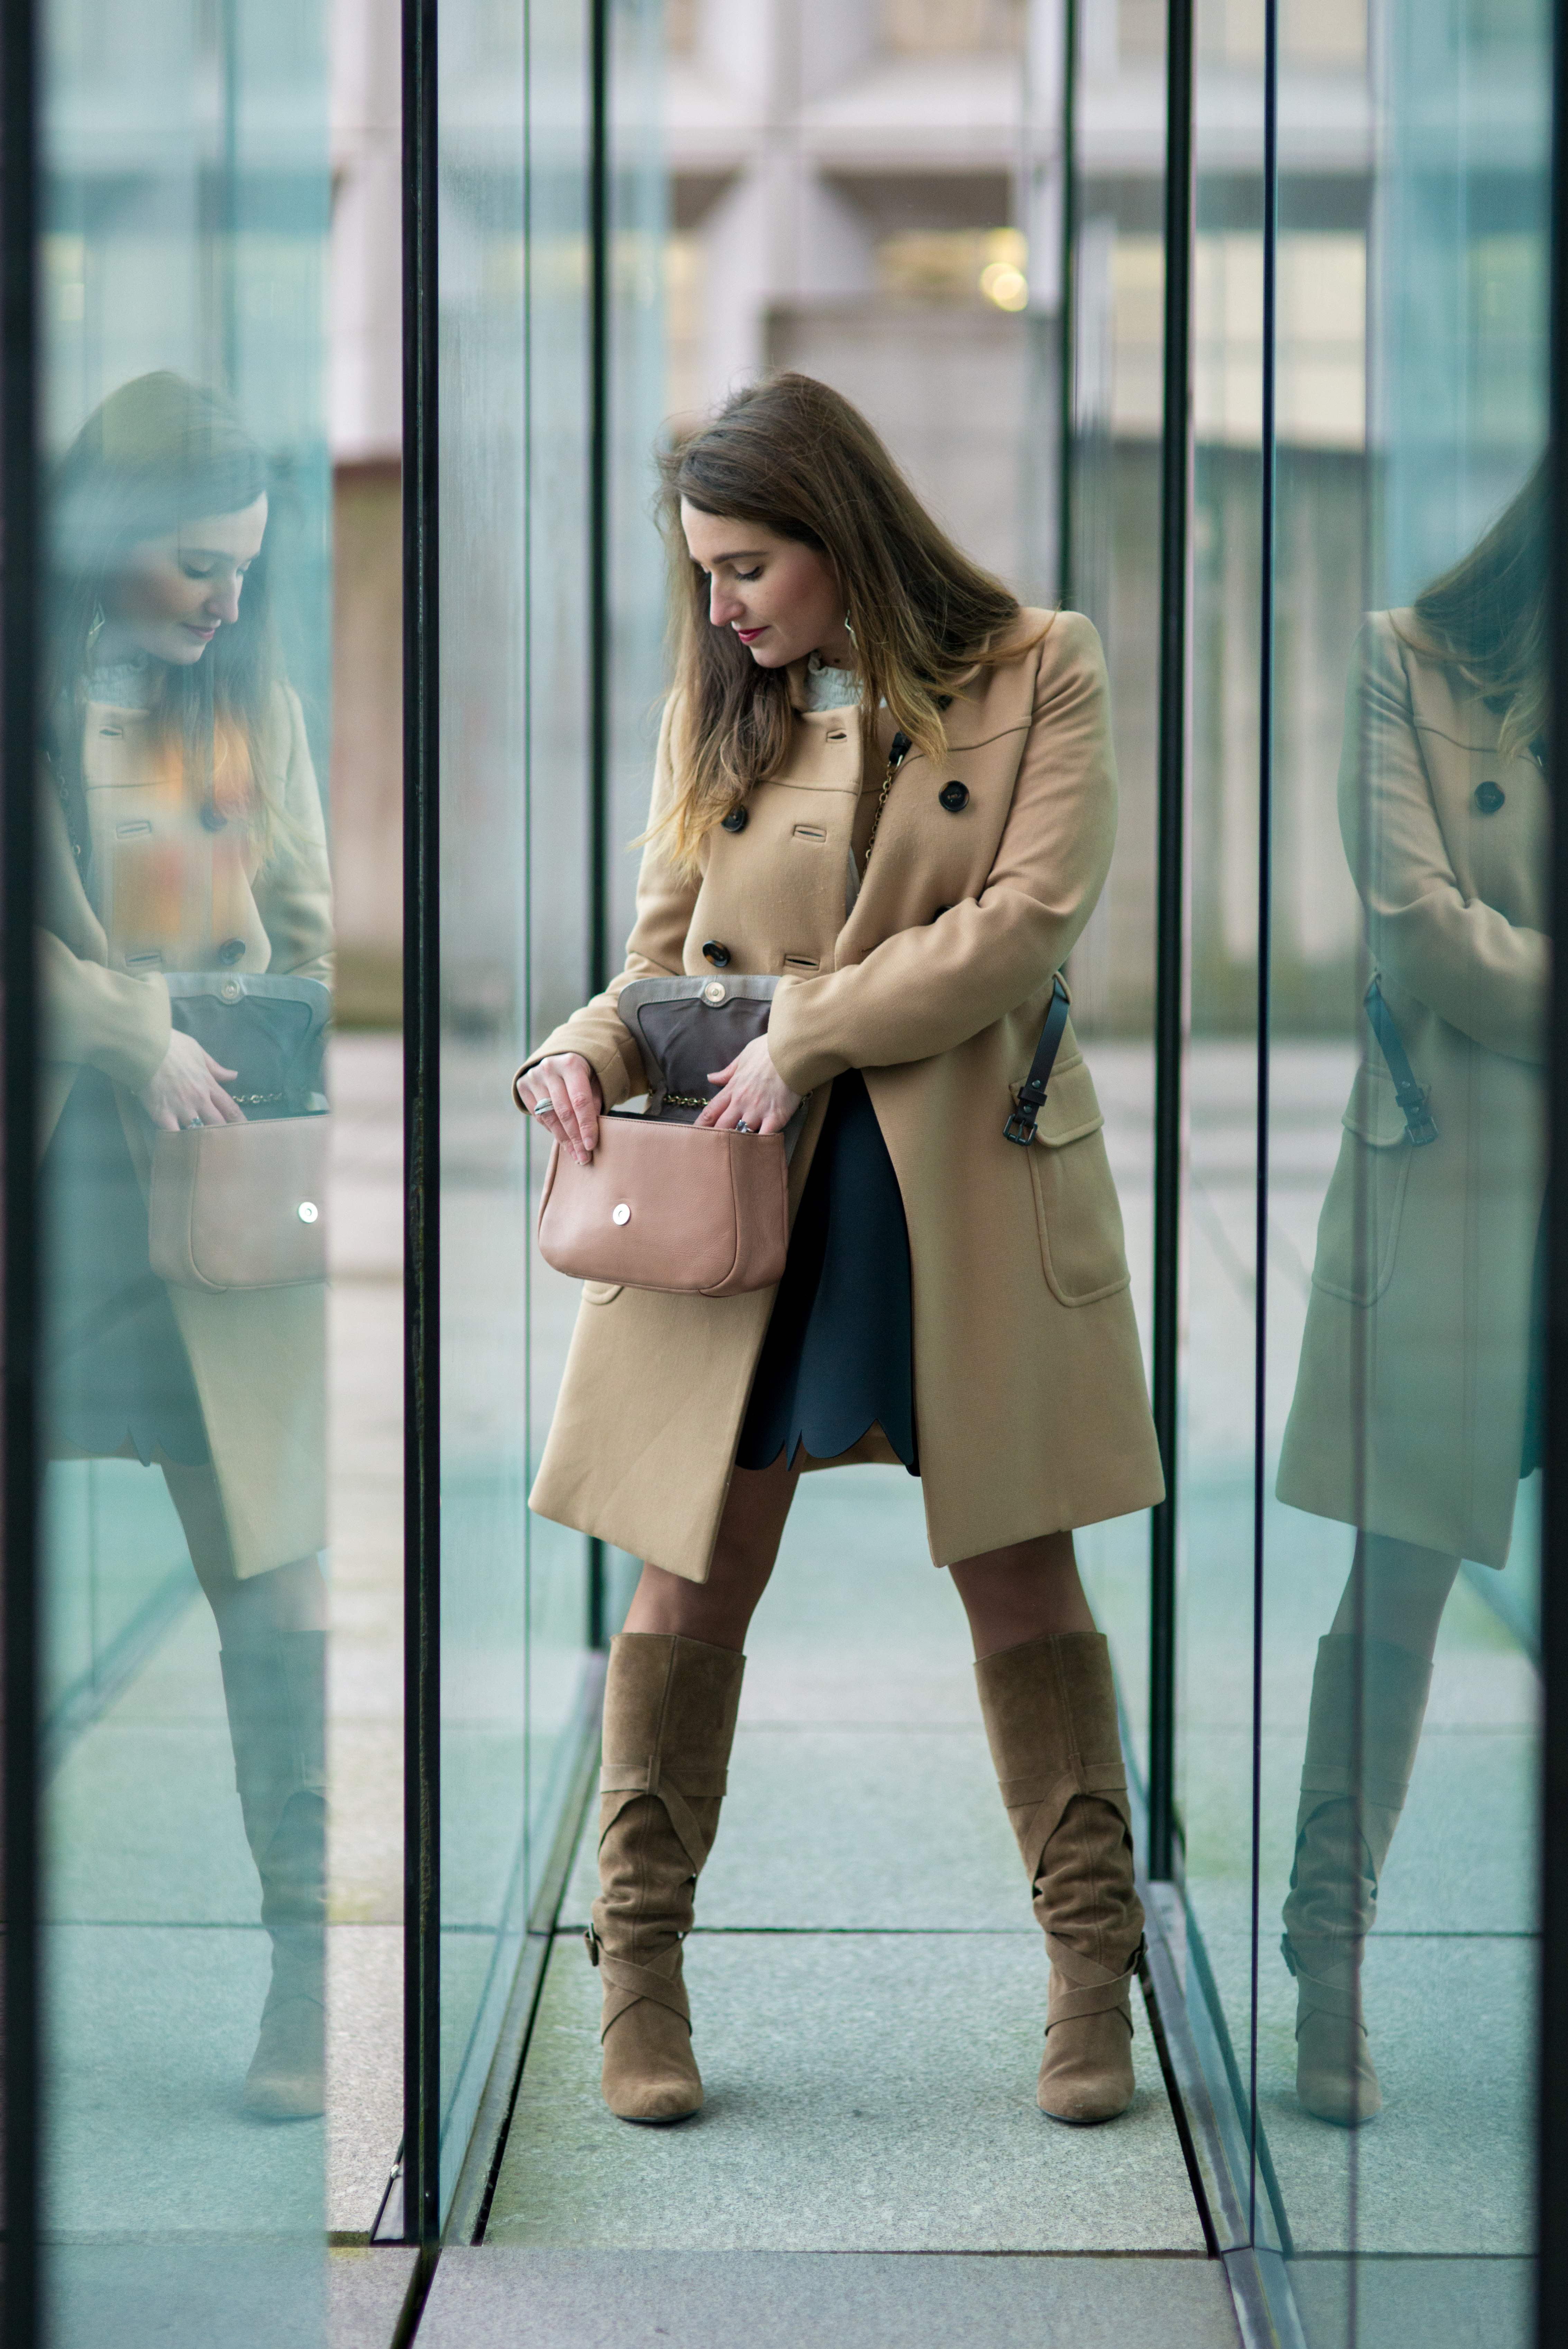 style-sophistique-modele-grandearche-ladefense-paris-fashionblogger-influencer-blouse-zara-seralynepointcom-ump_6638